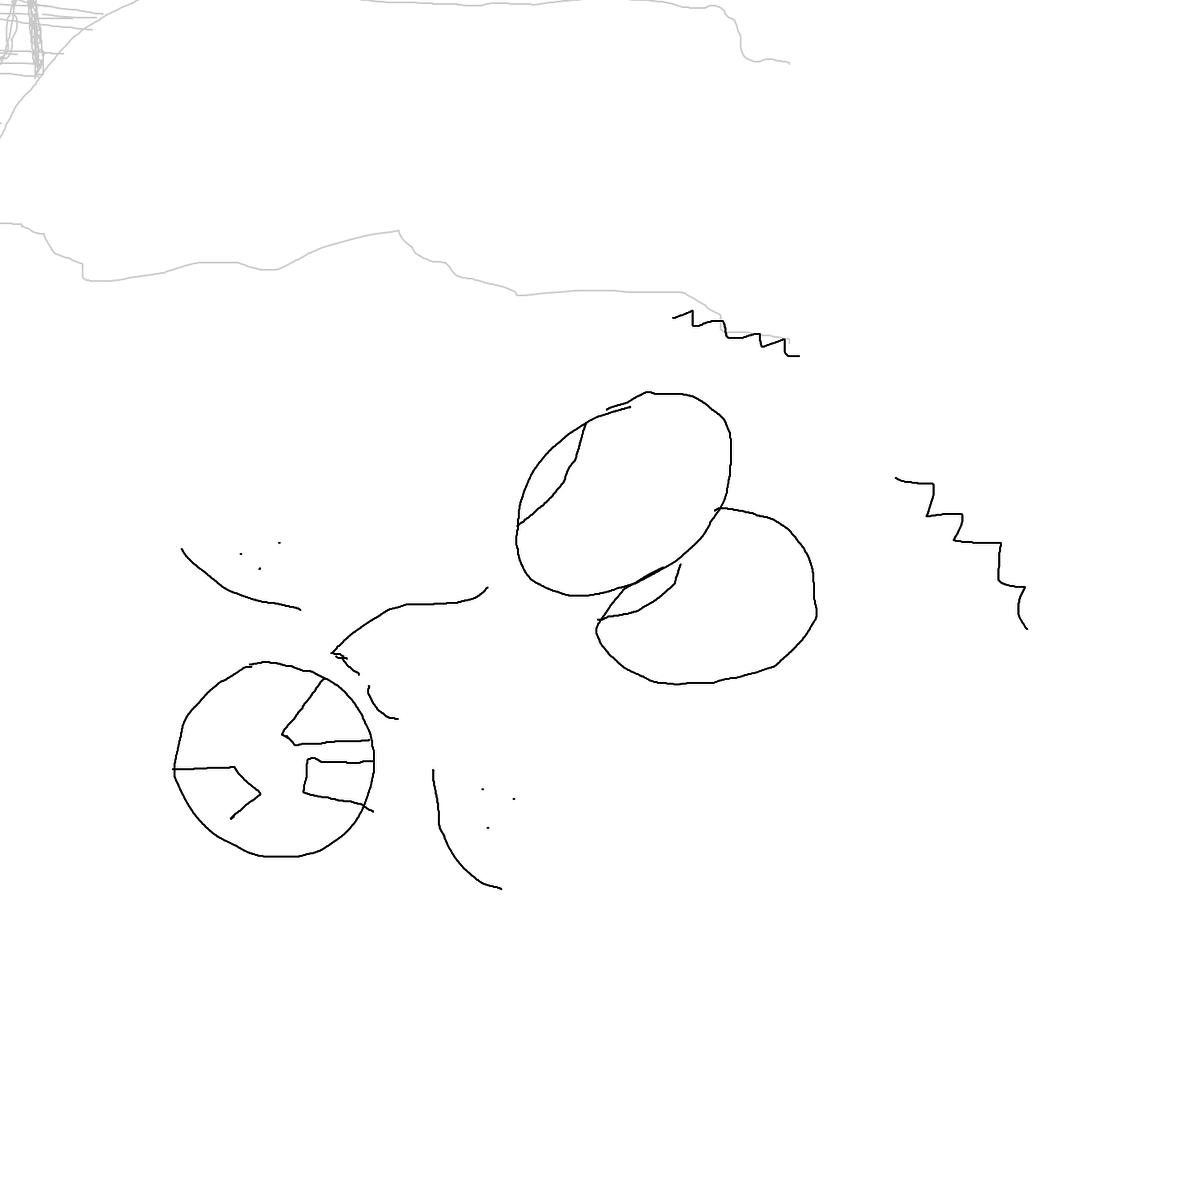 BAAAM drawing#16140 lat:29.6644096374511720lng: -95.2993469238281200